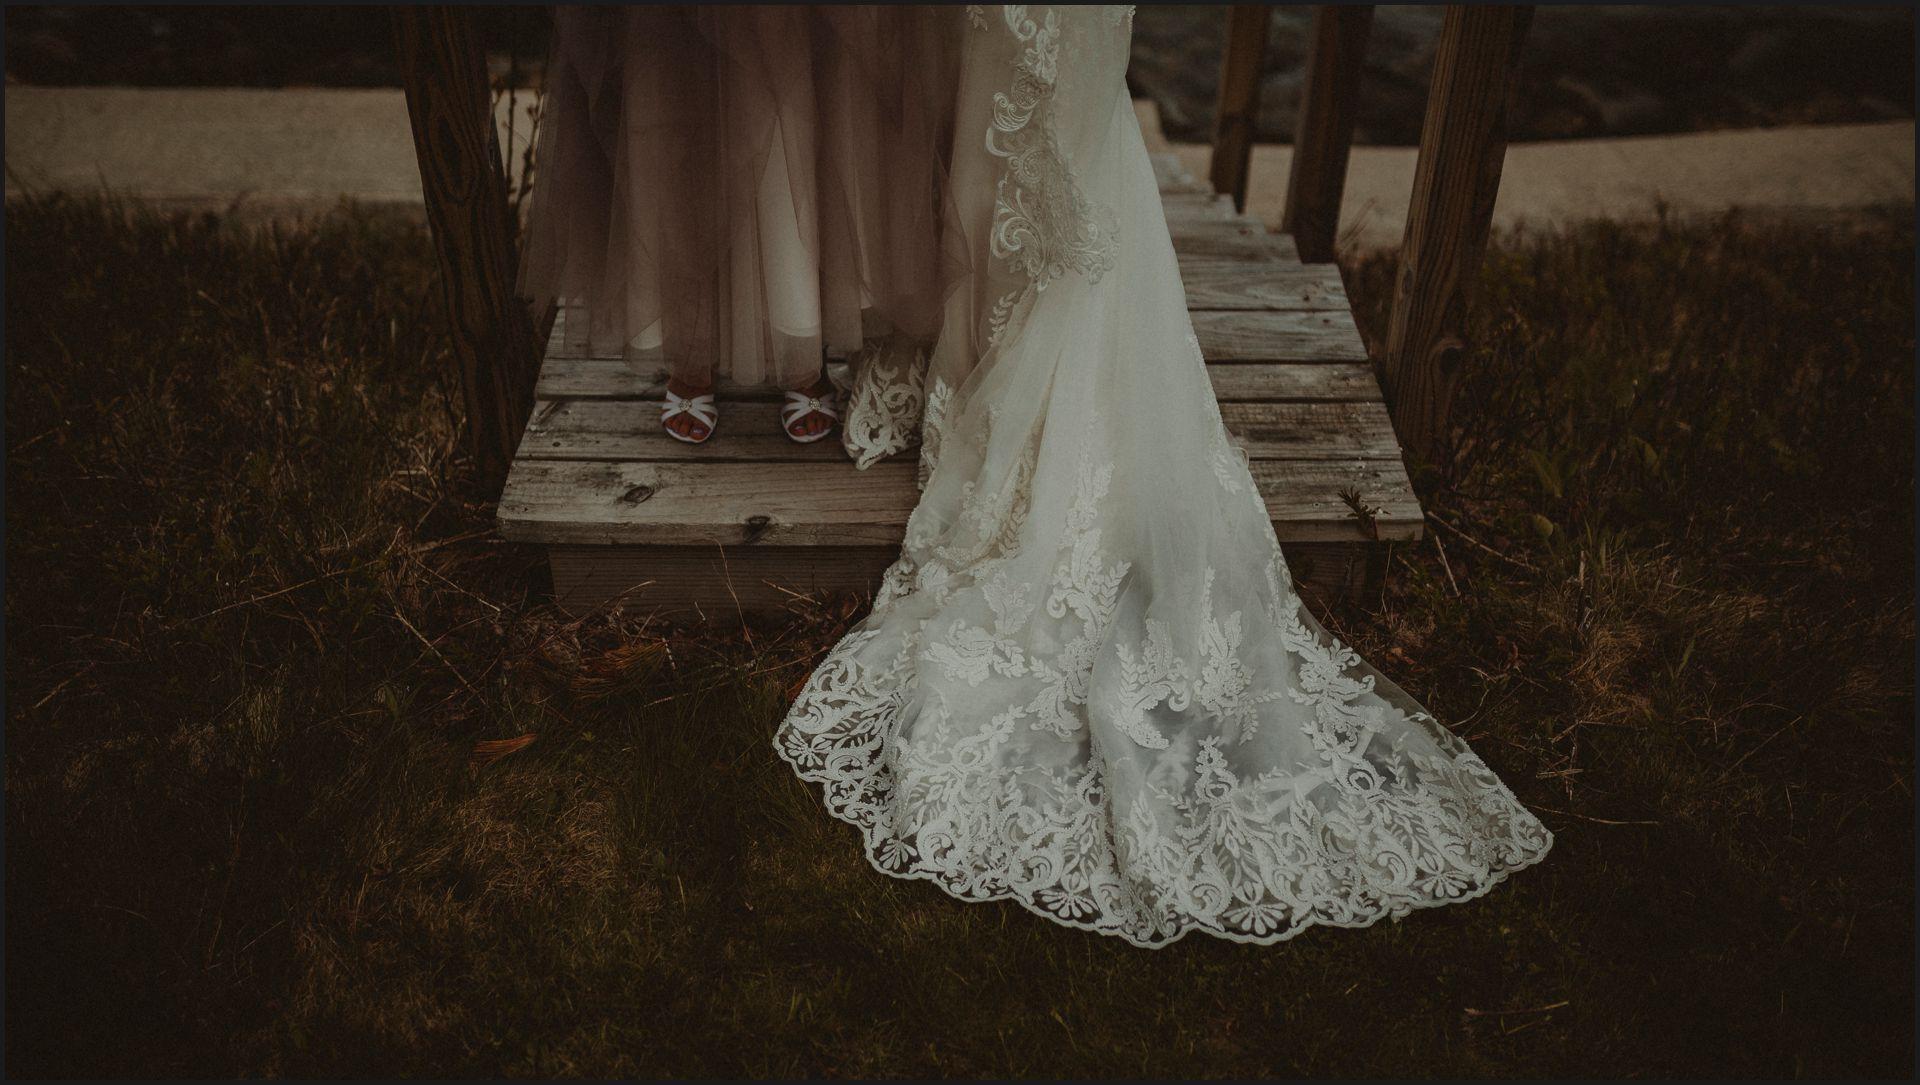 wedding details, feet, shoes, wedding details